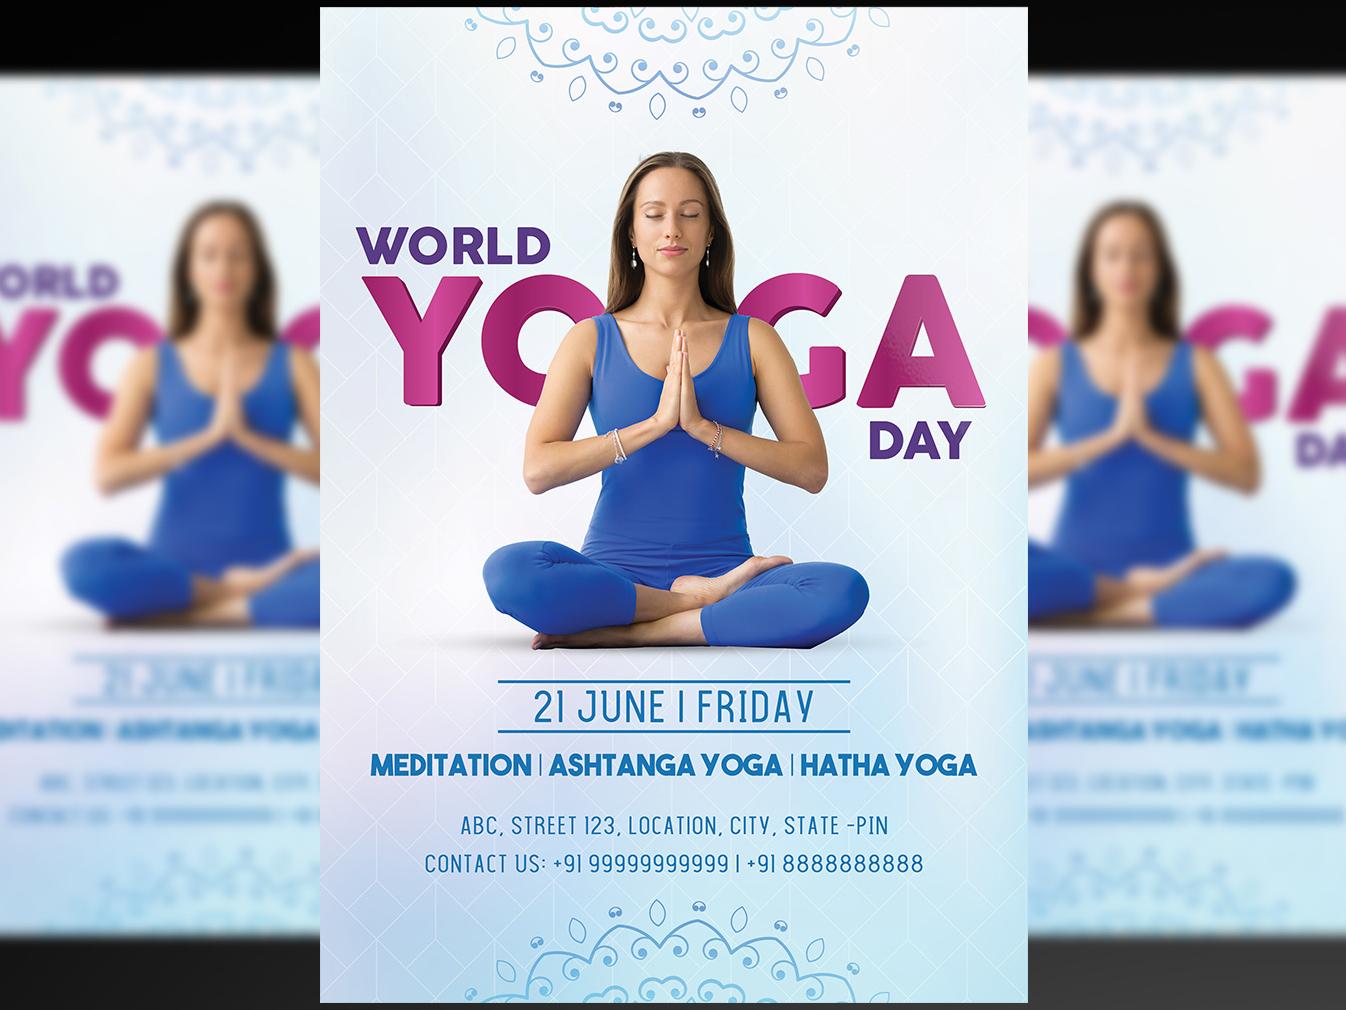 World Yoga Day Flyer+Social Media Post yoga social media social media yoga day social media internaational yoga day international yoga day flyer yoga positions yoga pose yoga asana yoga yoga day flyer yoga day